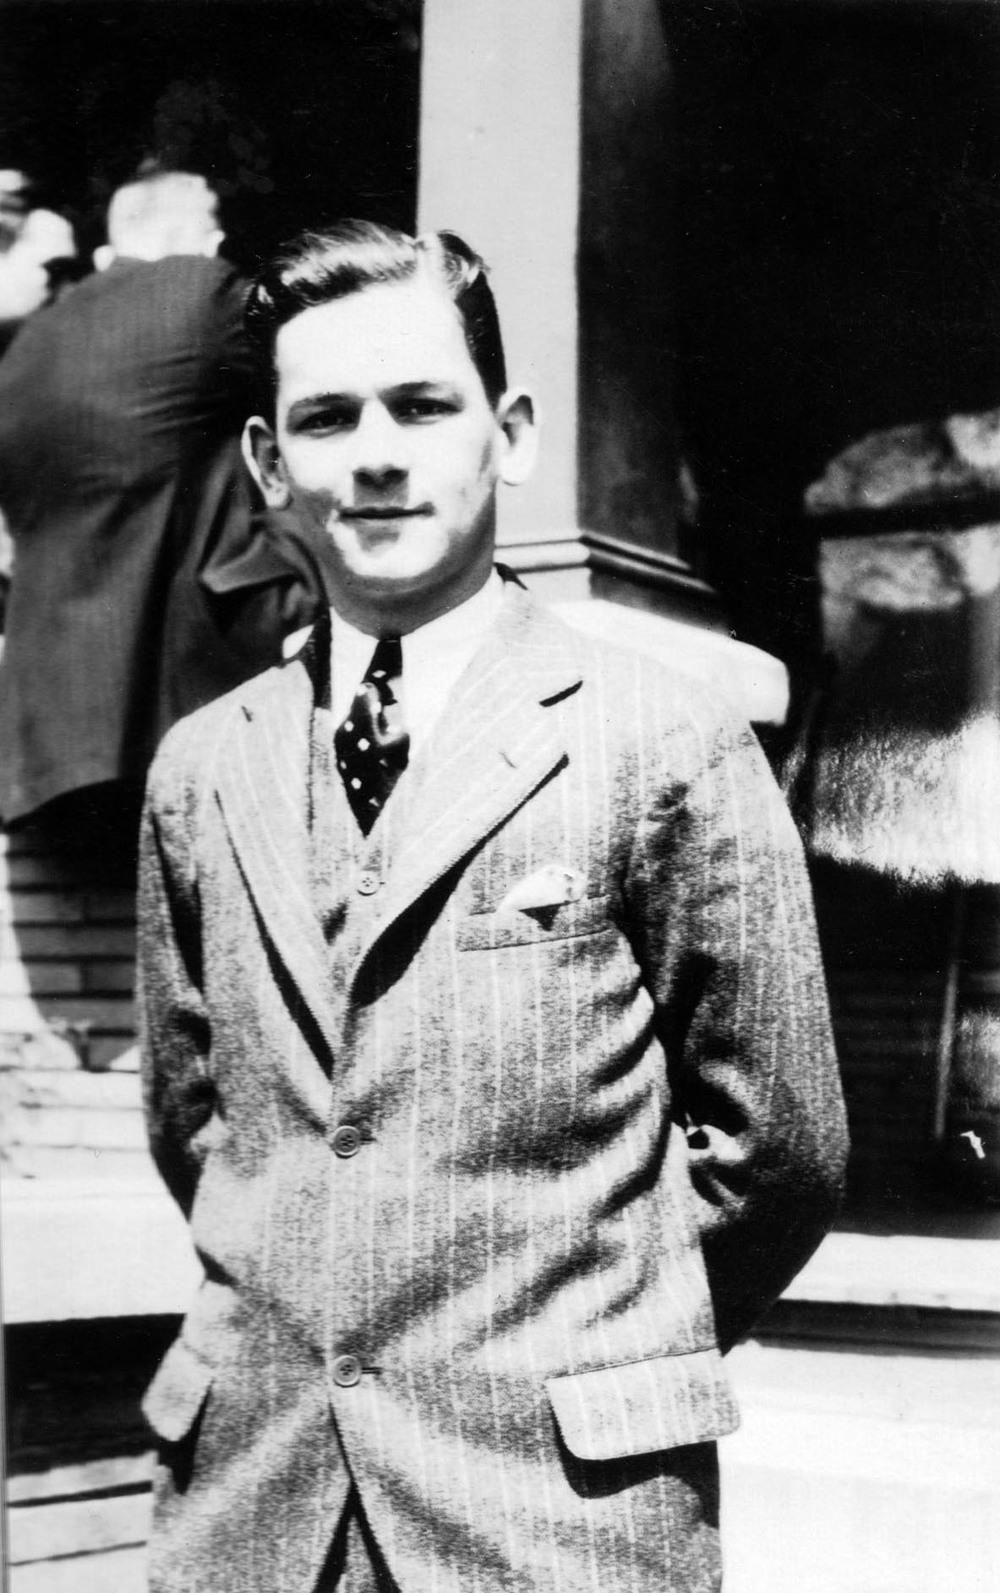 Charles P. Schwenk 1932